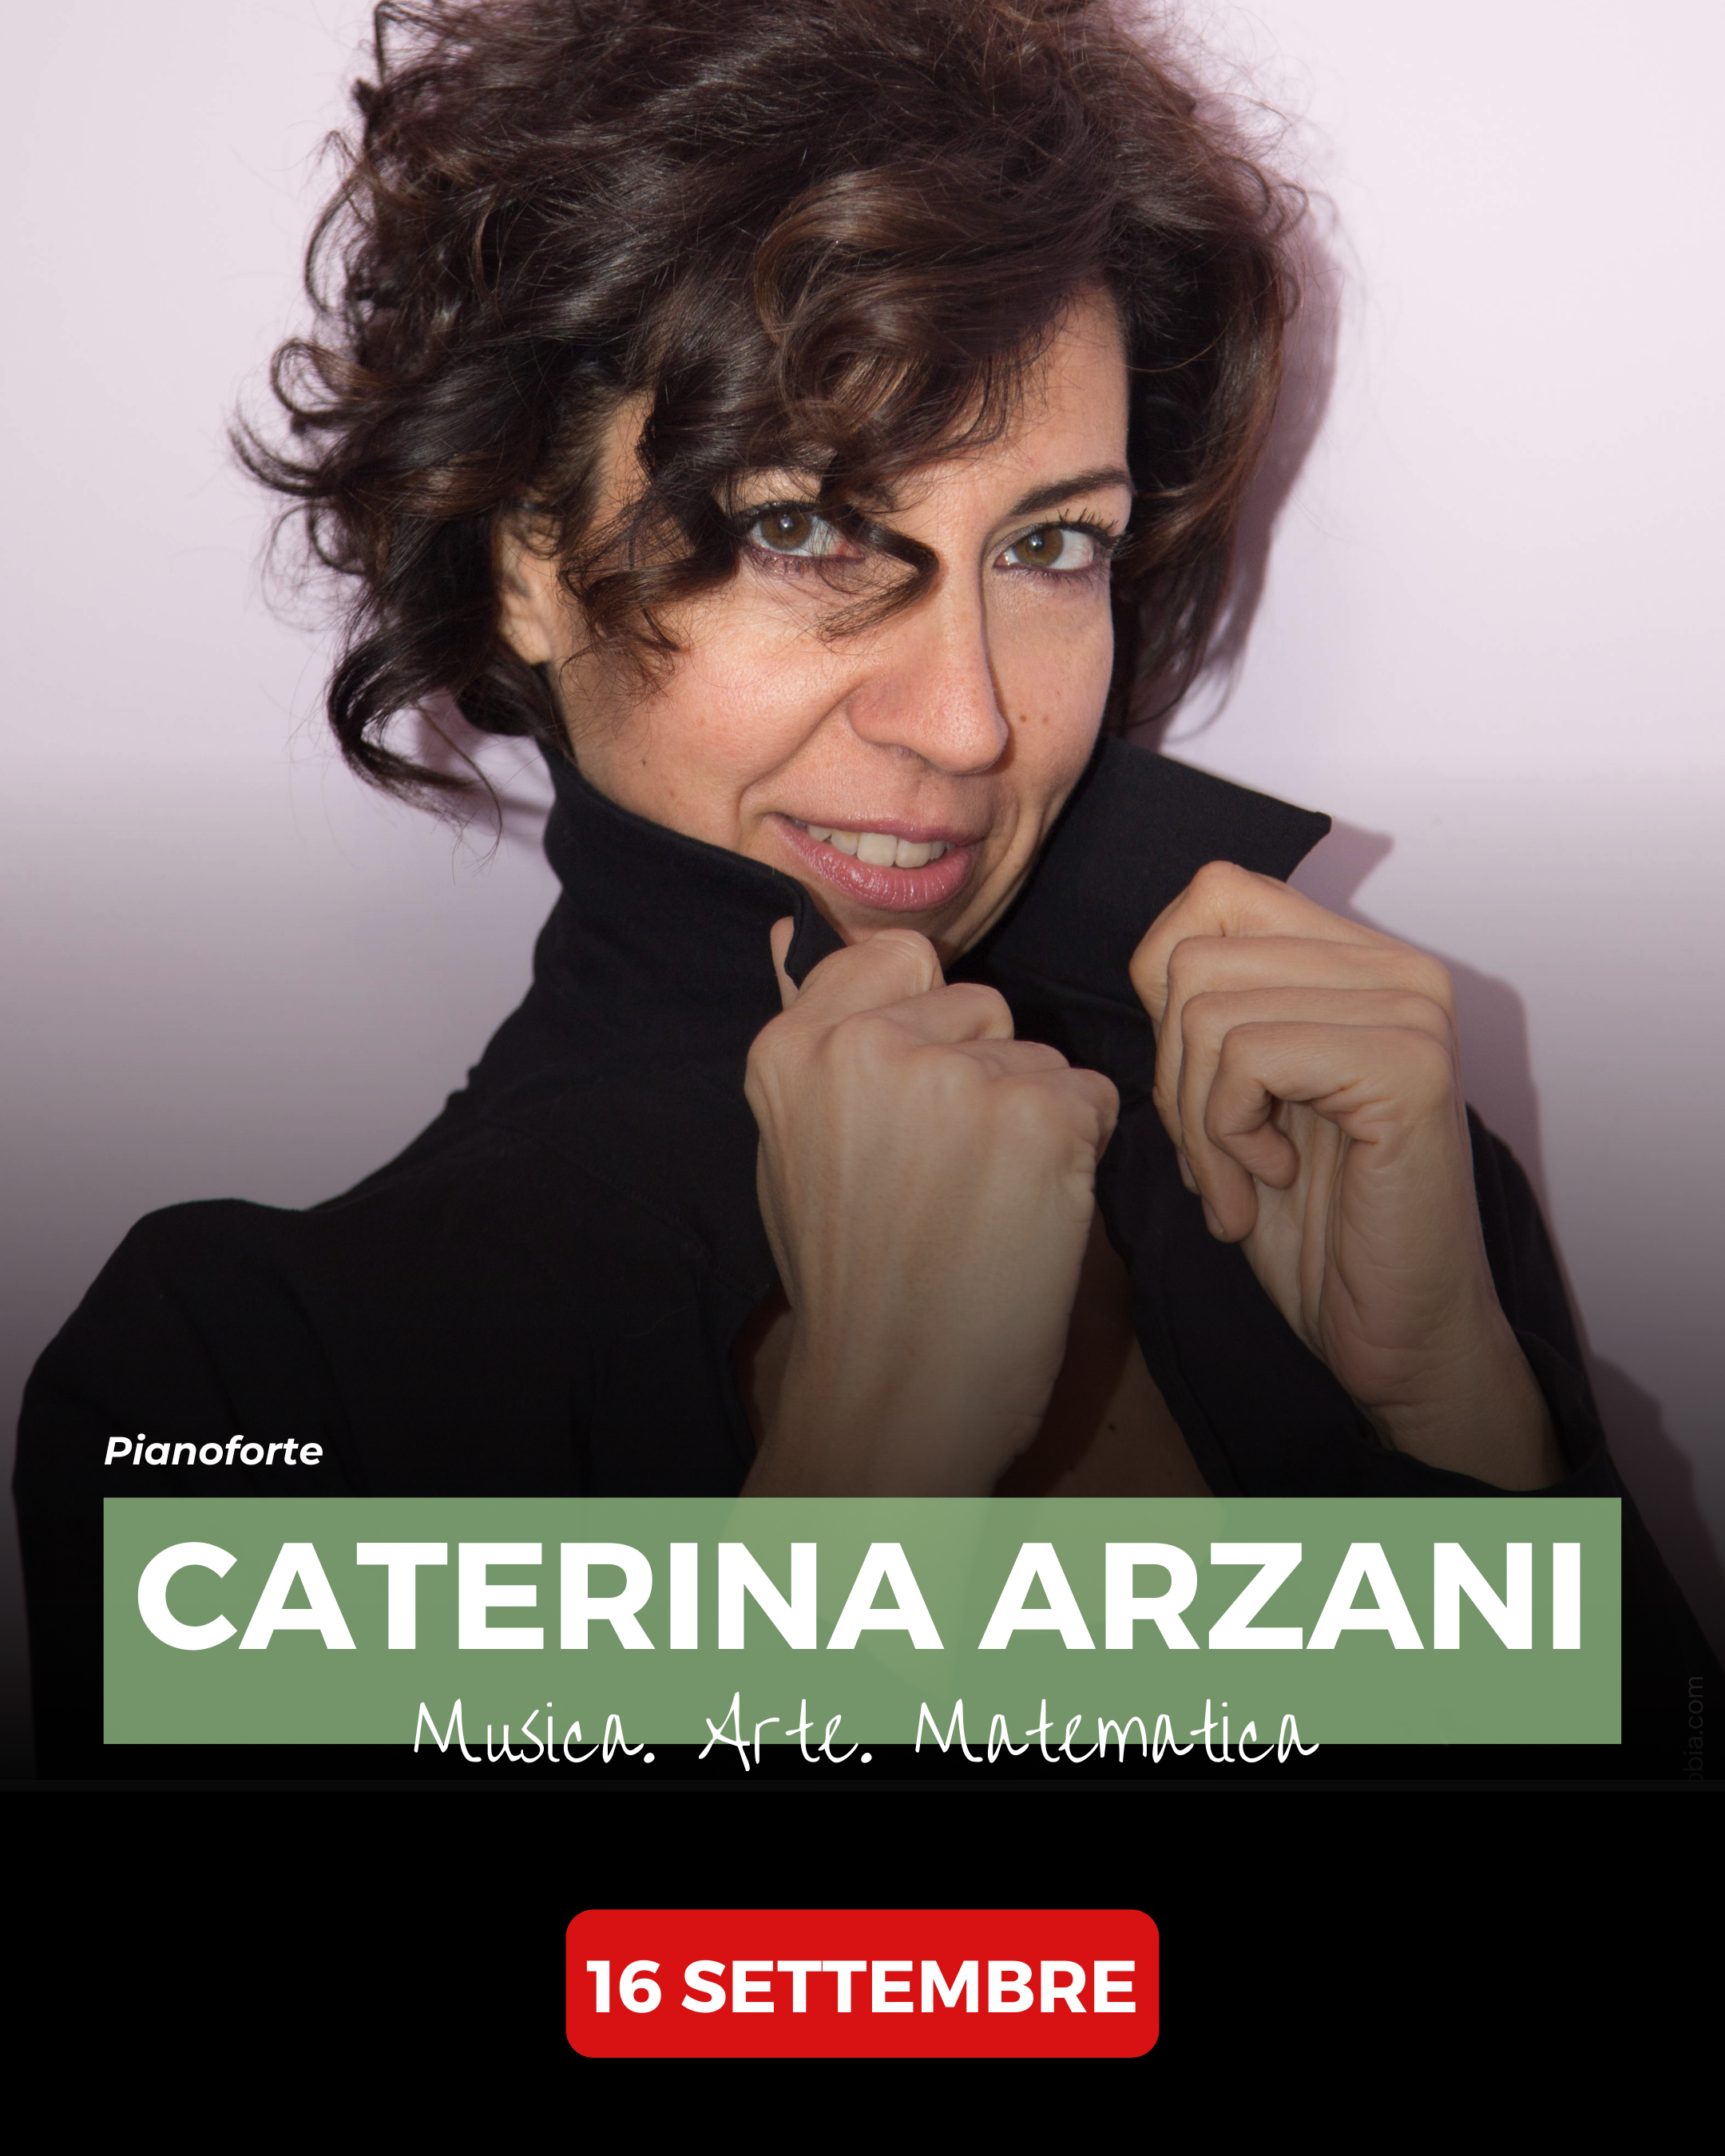 CATERINA ARZANI